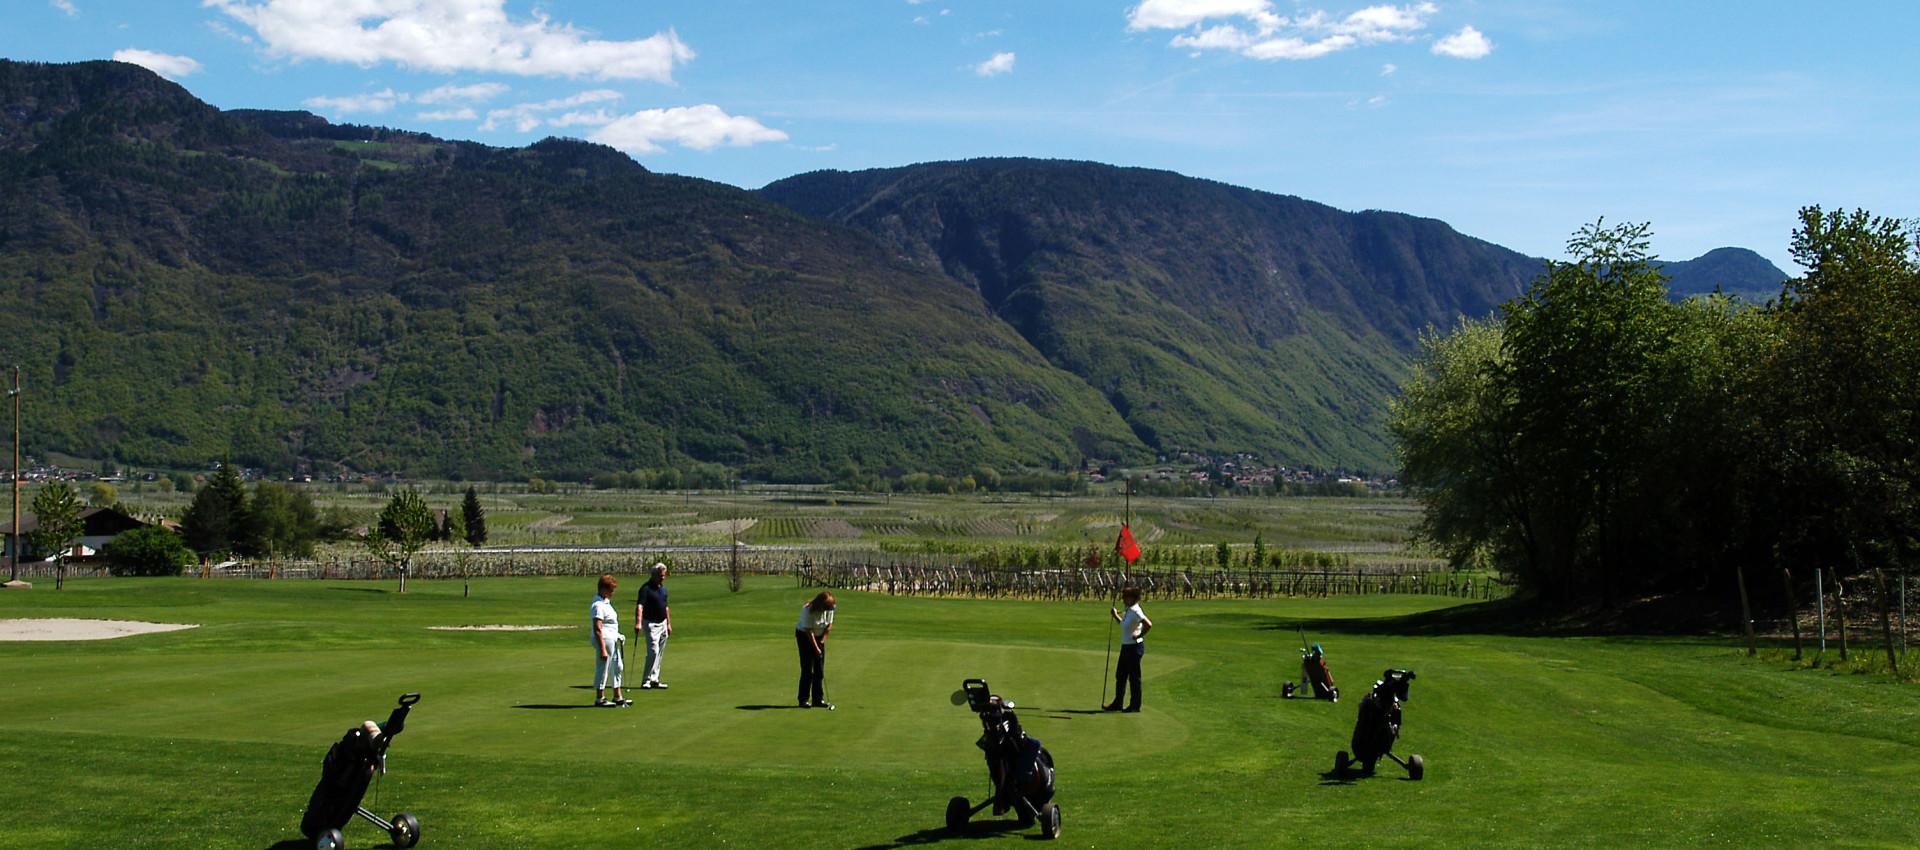 Golfurlaub in Lana, Südtiol